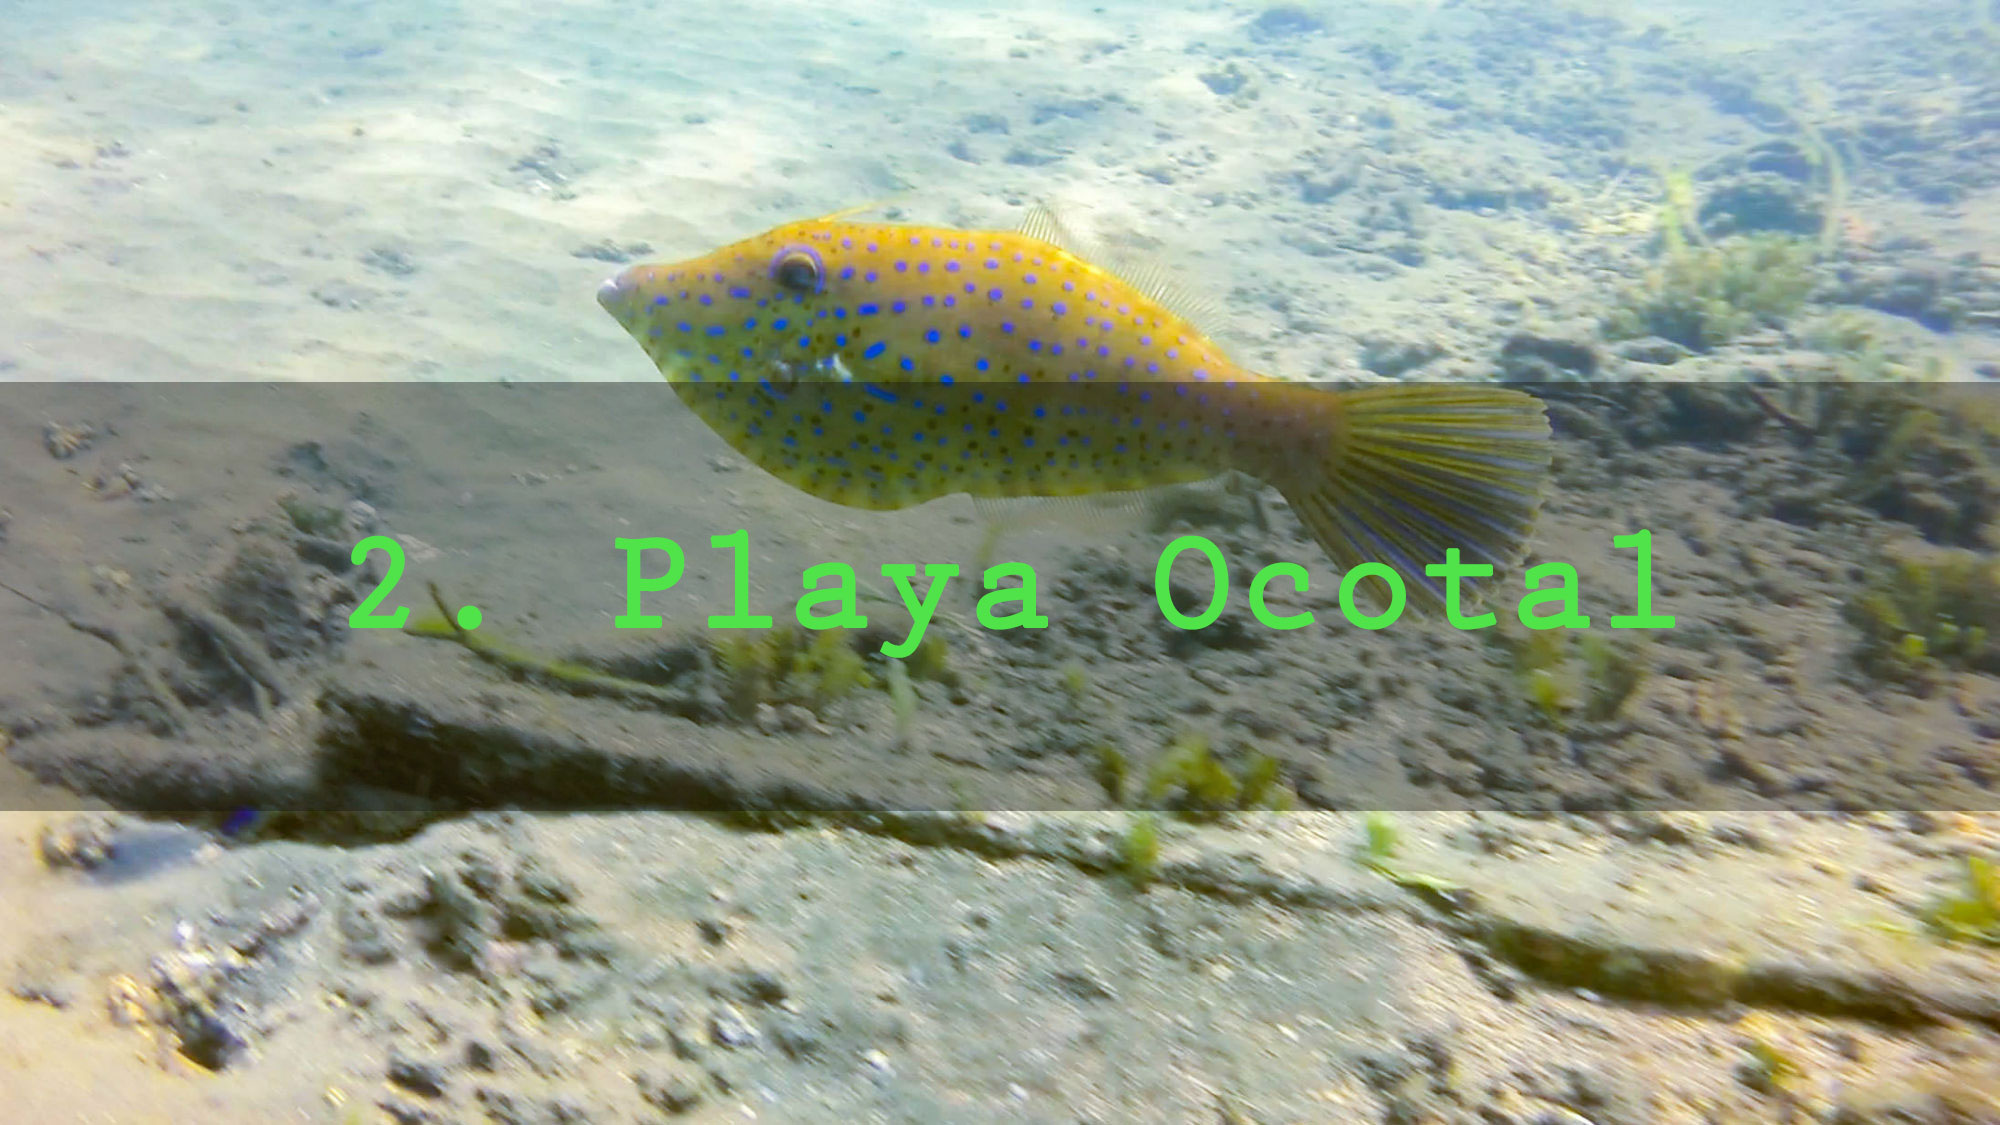 Snorkeling Playa Ocotal Beach